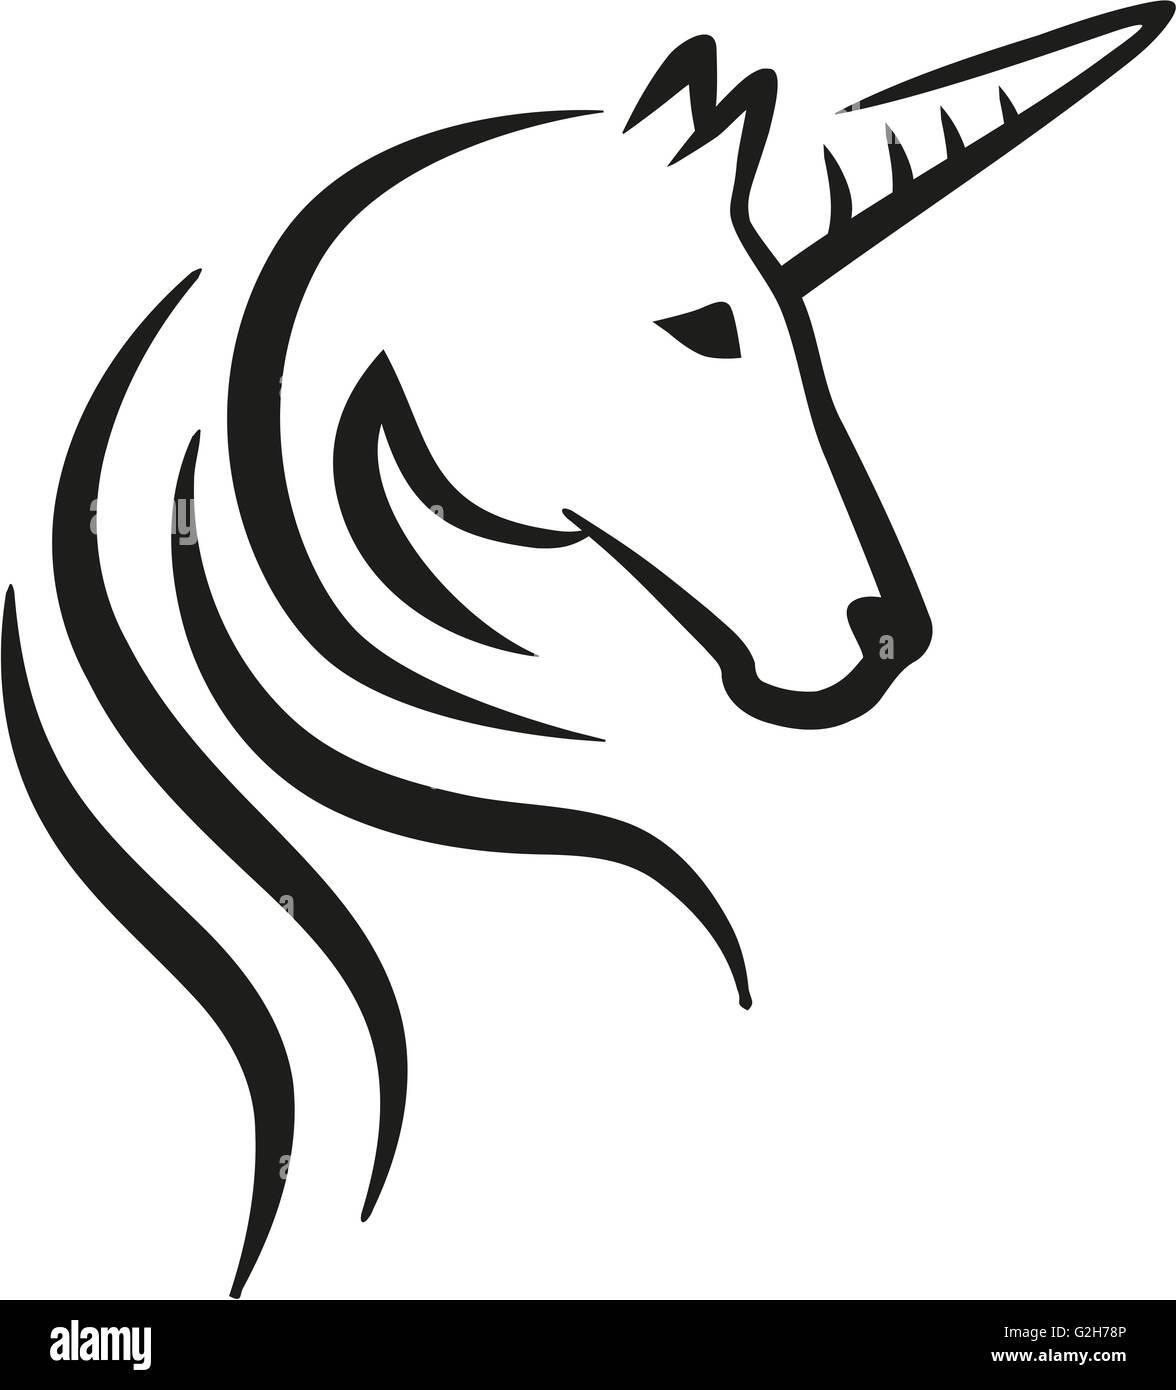 unicorn logo stockfotos unicorn logo bilder alamy. Black Bedroom Furniture Sets. Home Design Ideas